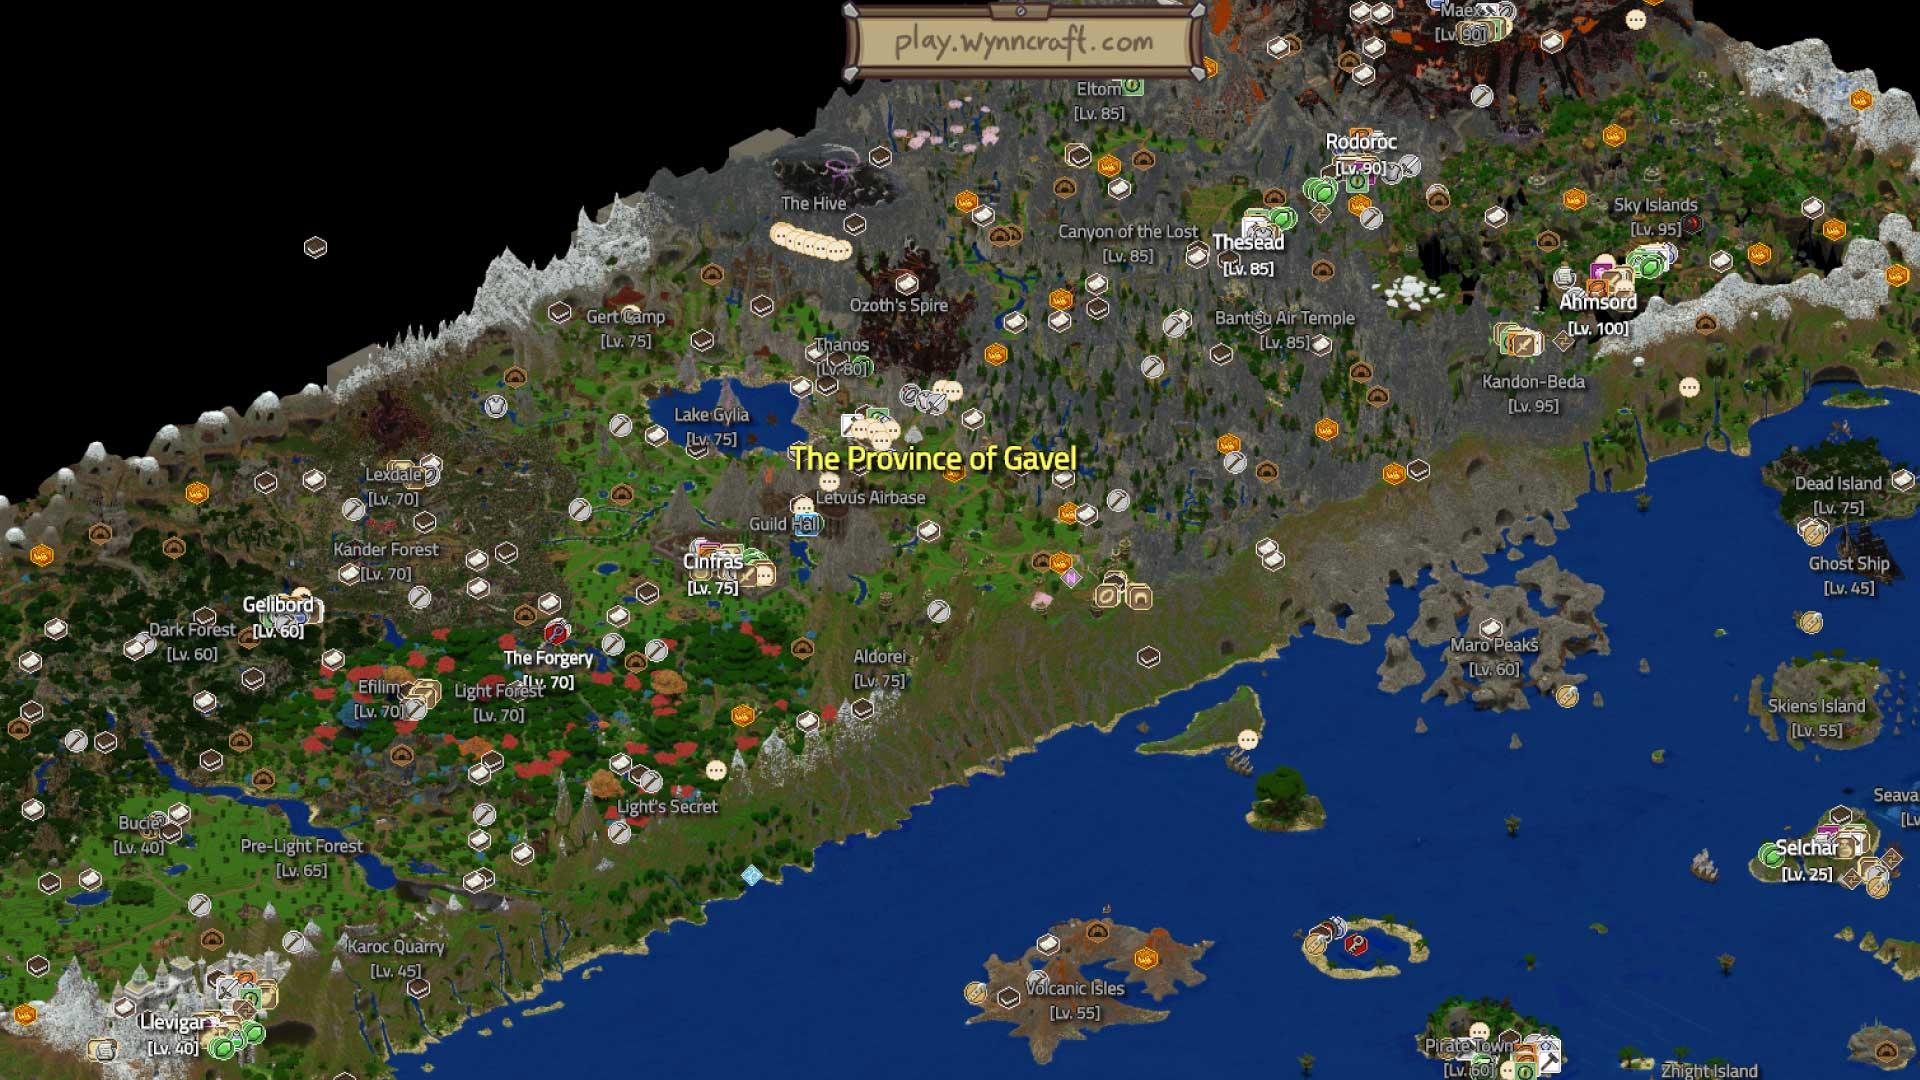 Wynncraft Minecraft MMORPG